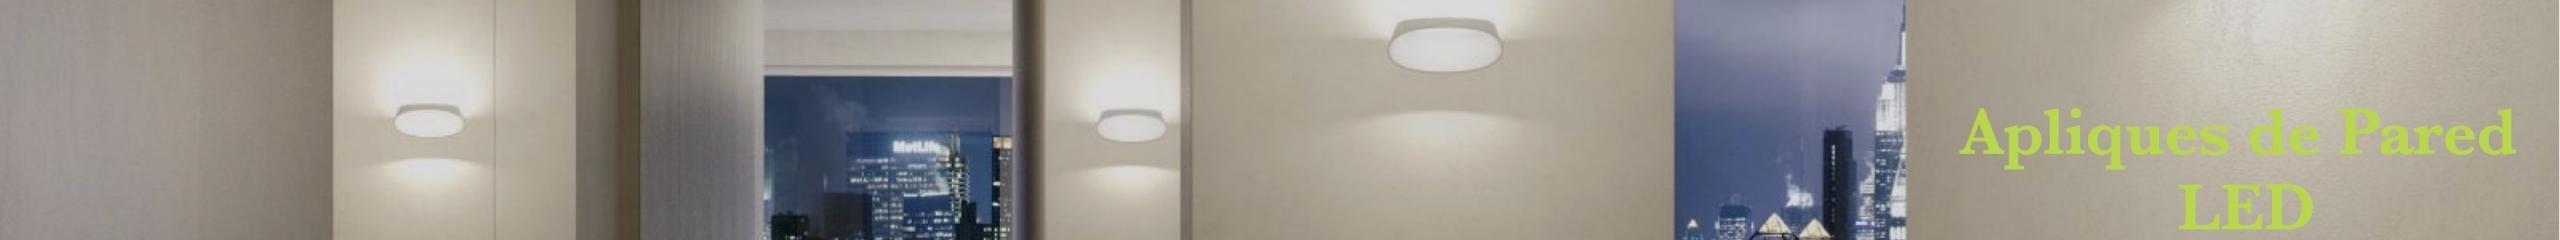 Apliques Pared LED